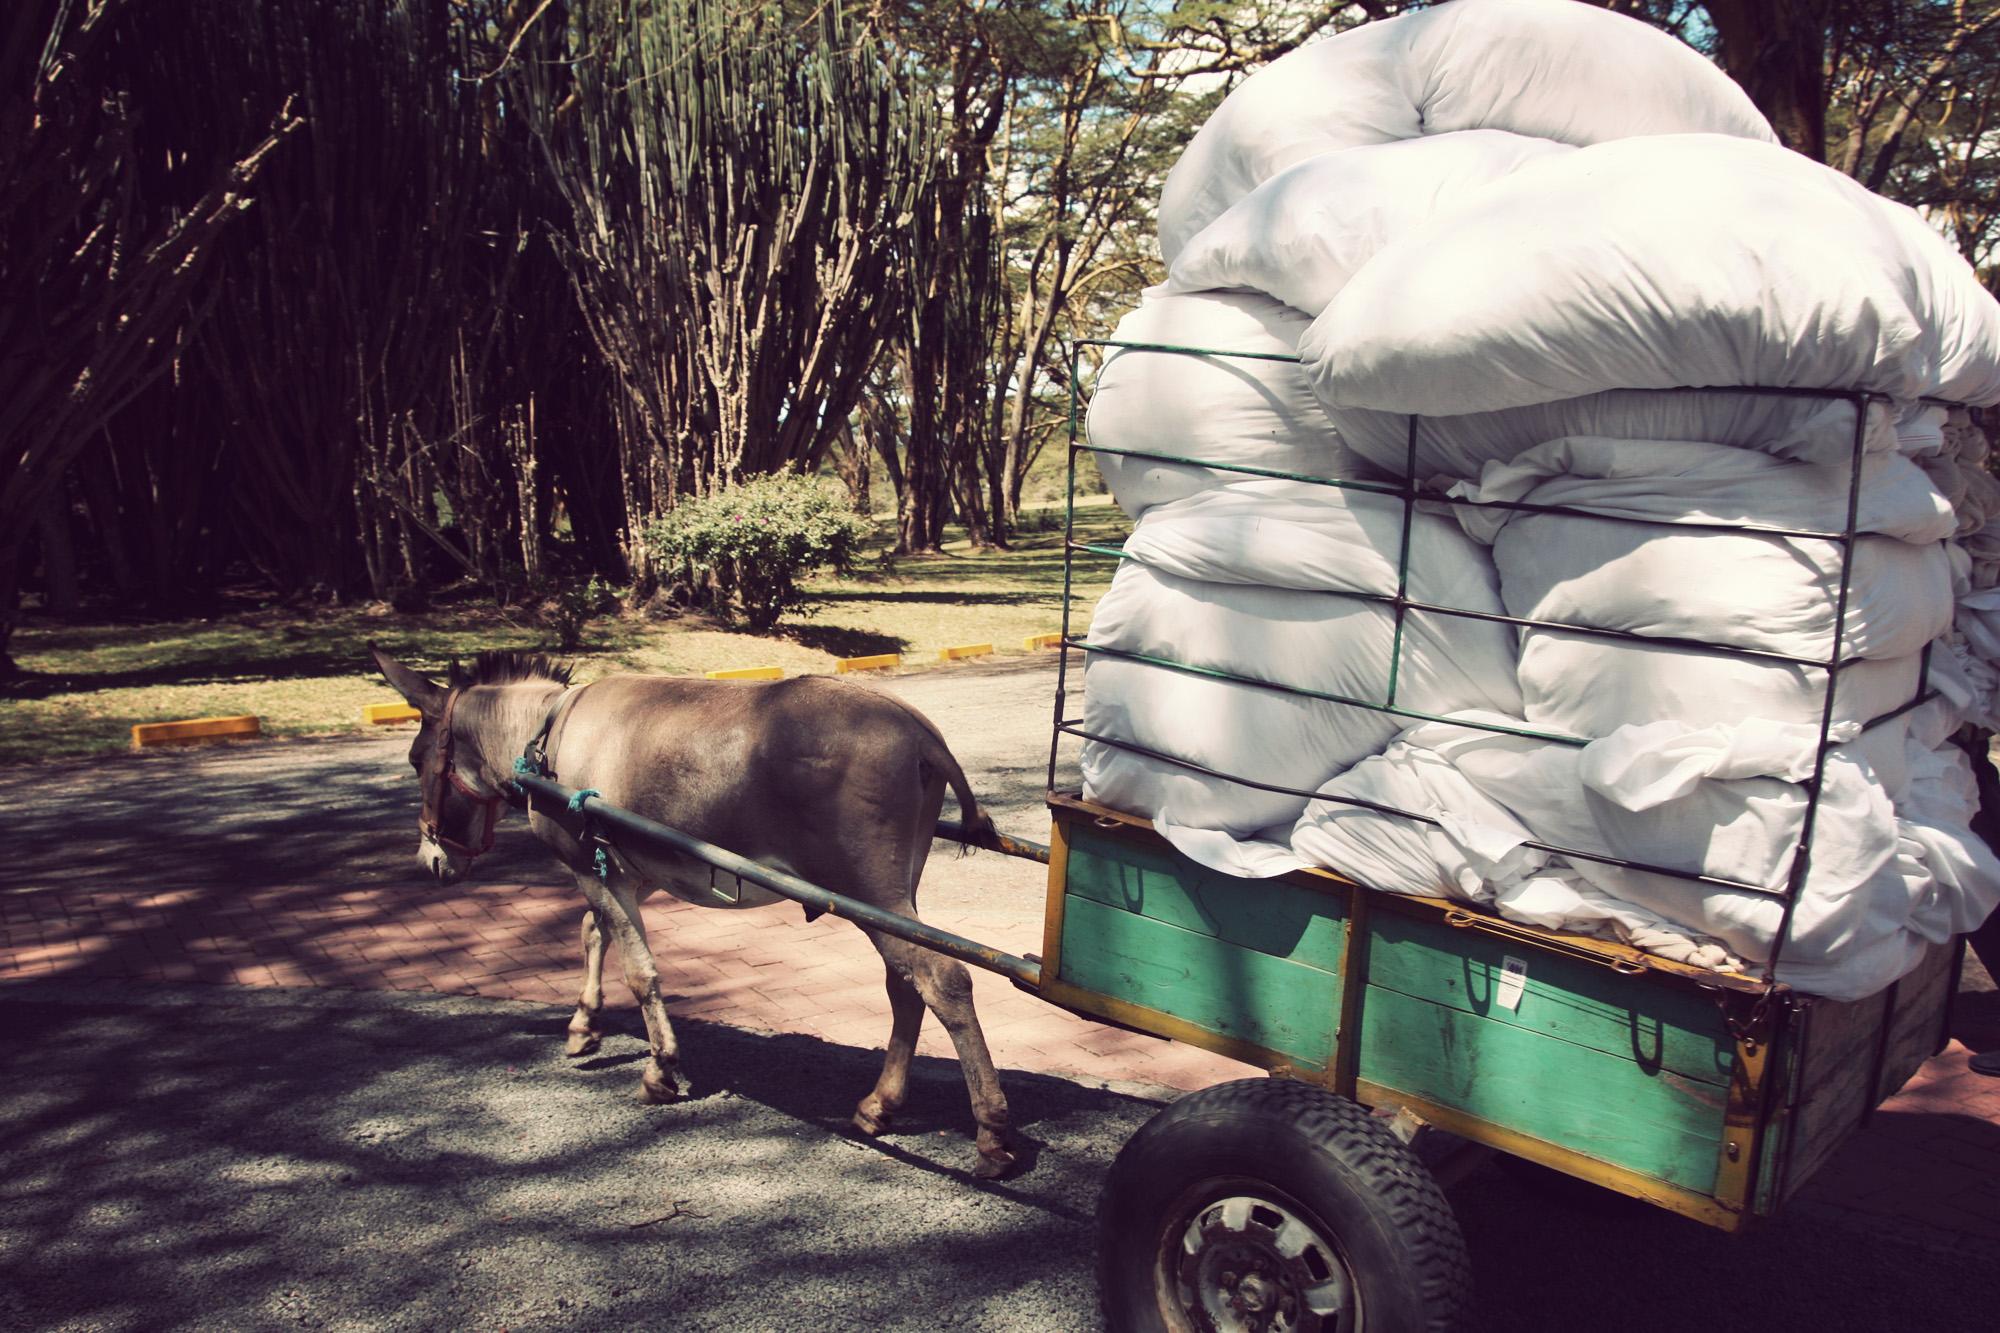 I think we can all agree we need laundry donkeys.